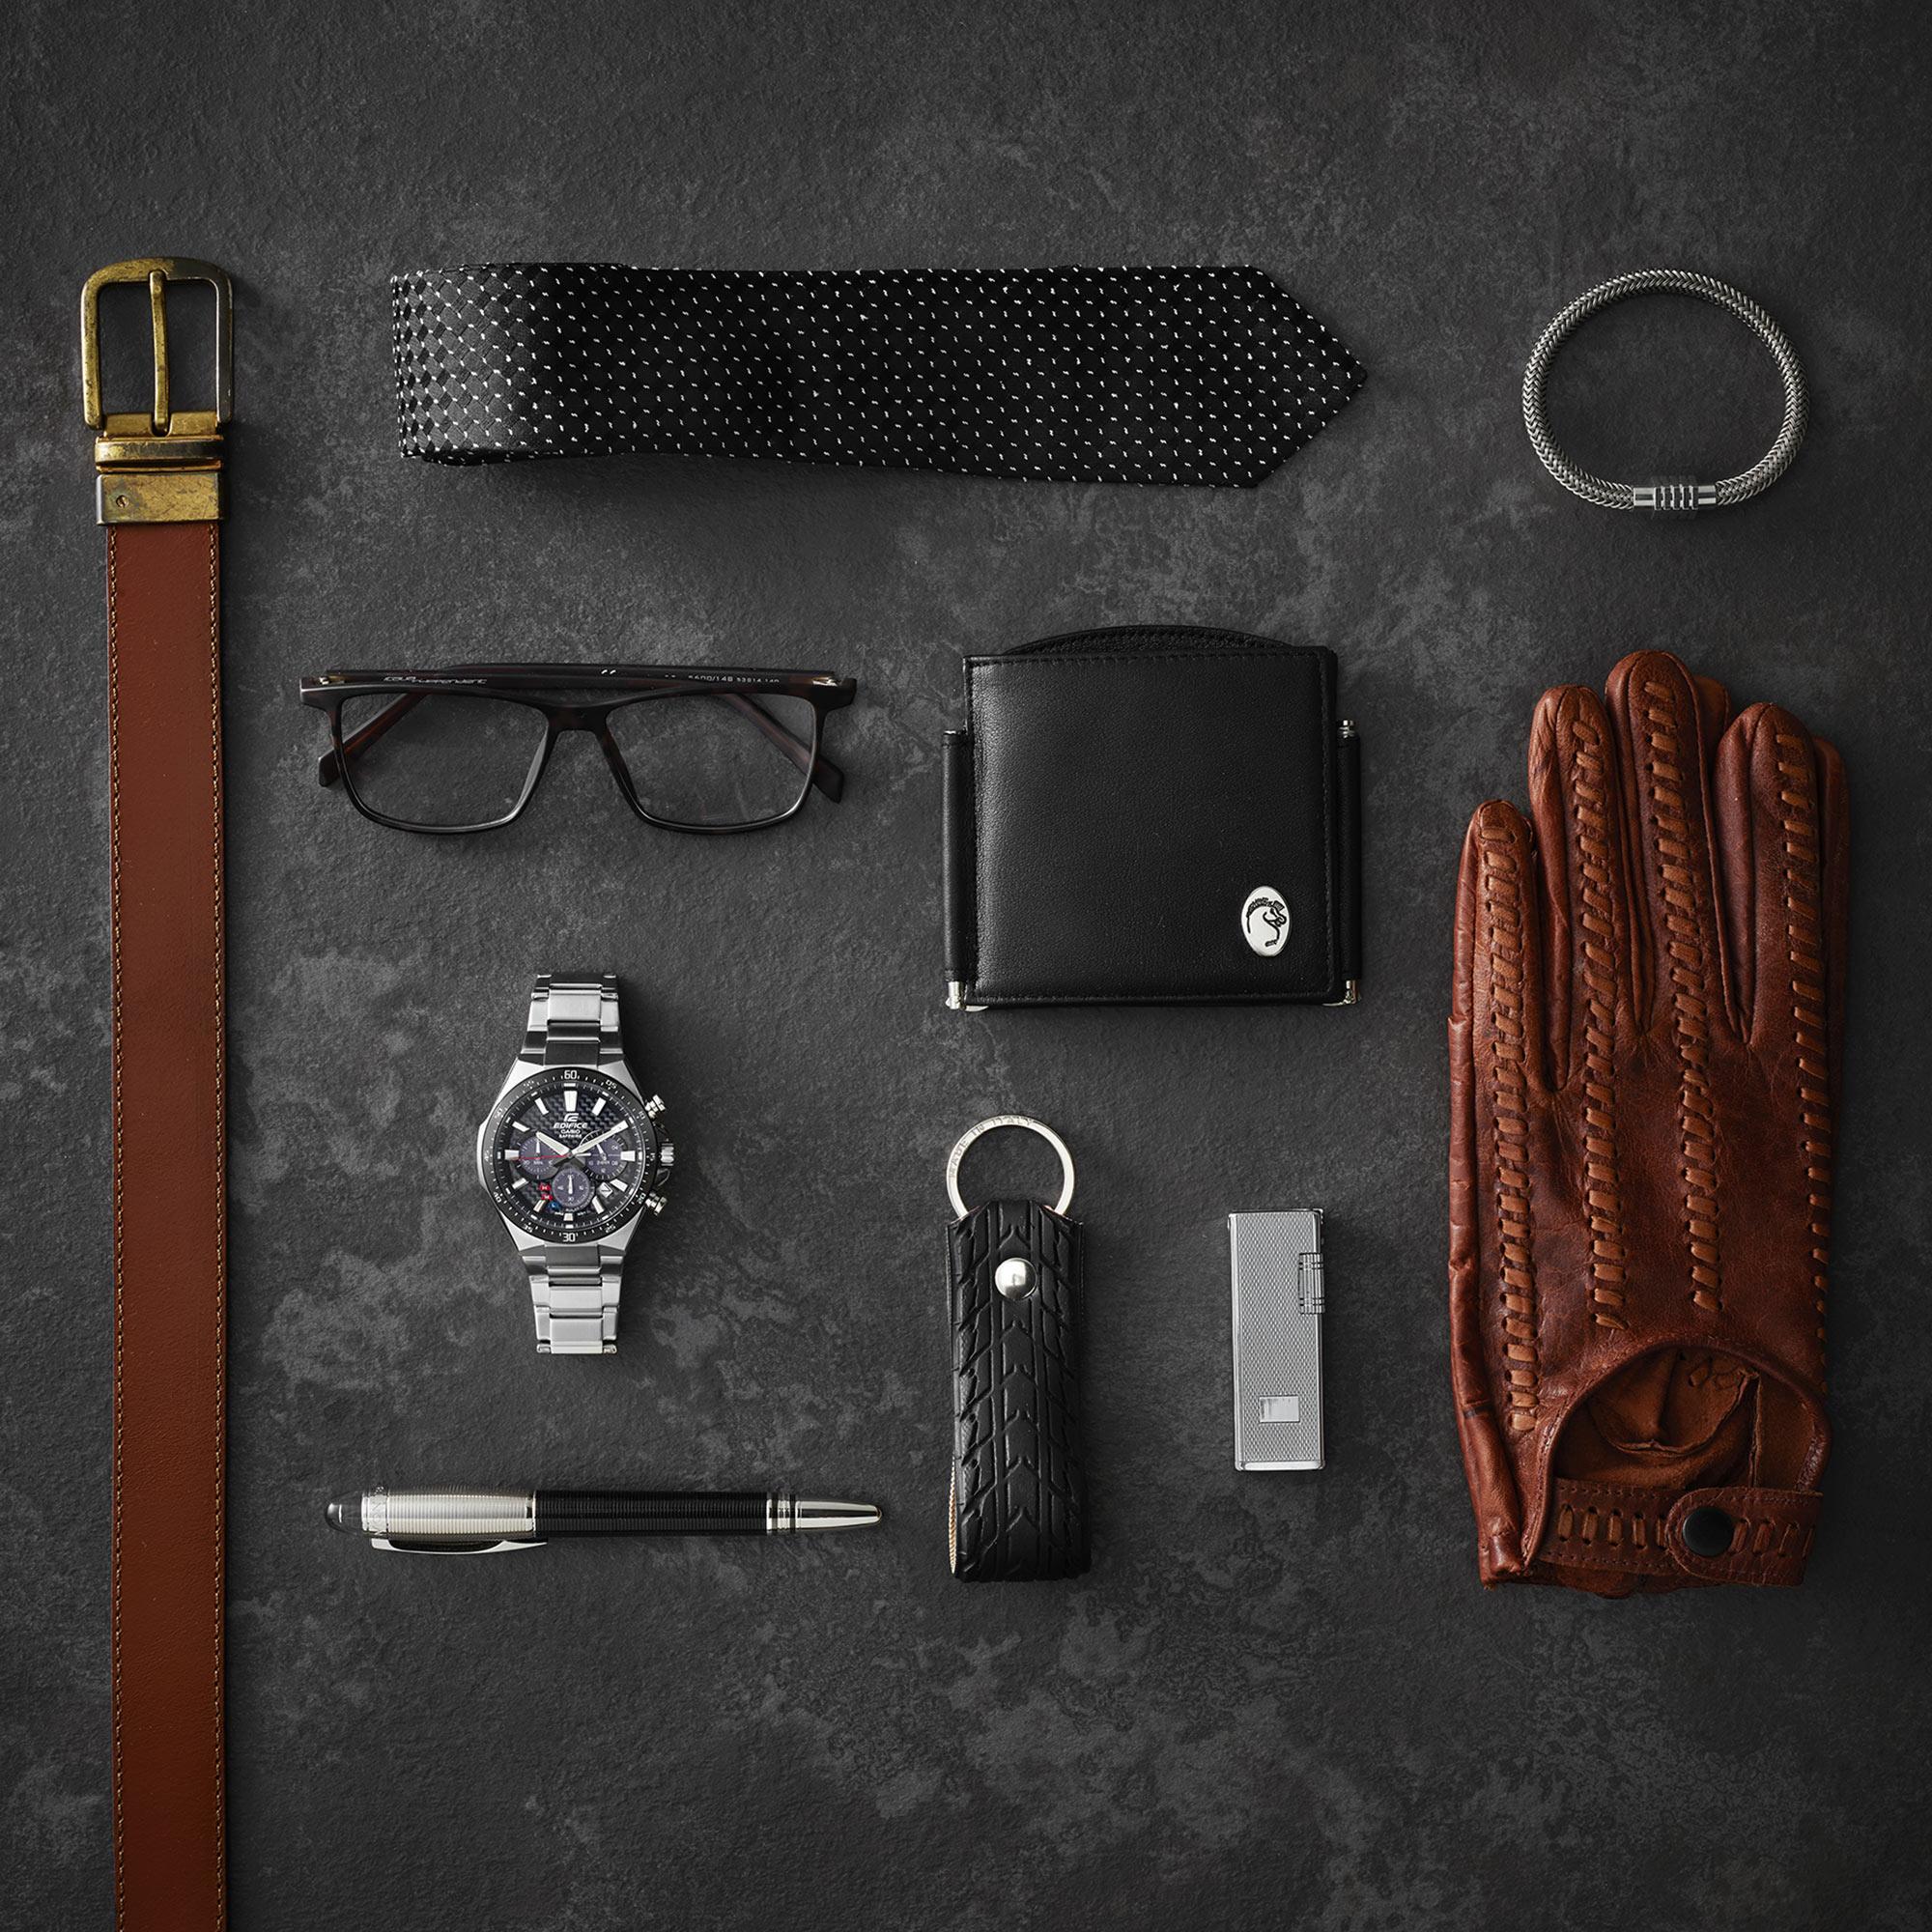 Man Tie Belt Glasses Pen Glove Still Life Shot for Casio by Fotografando